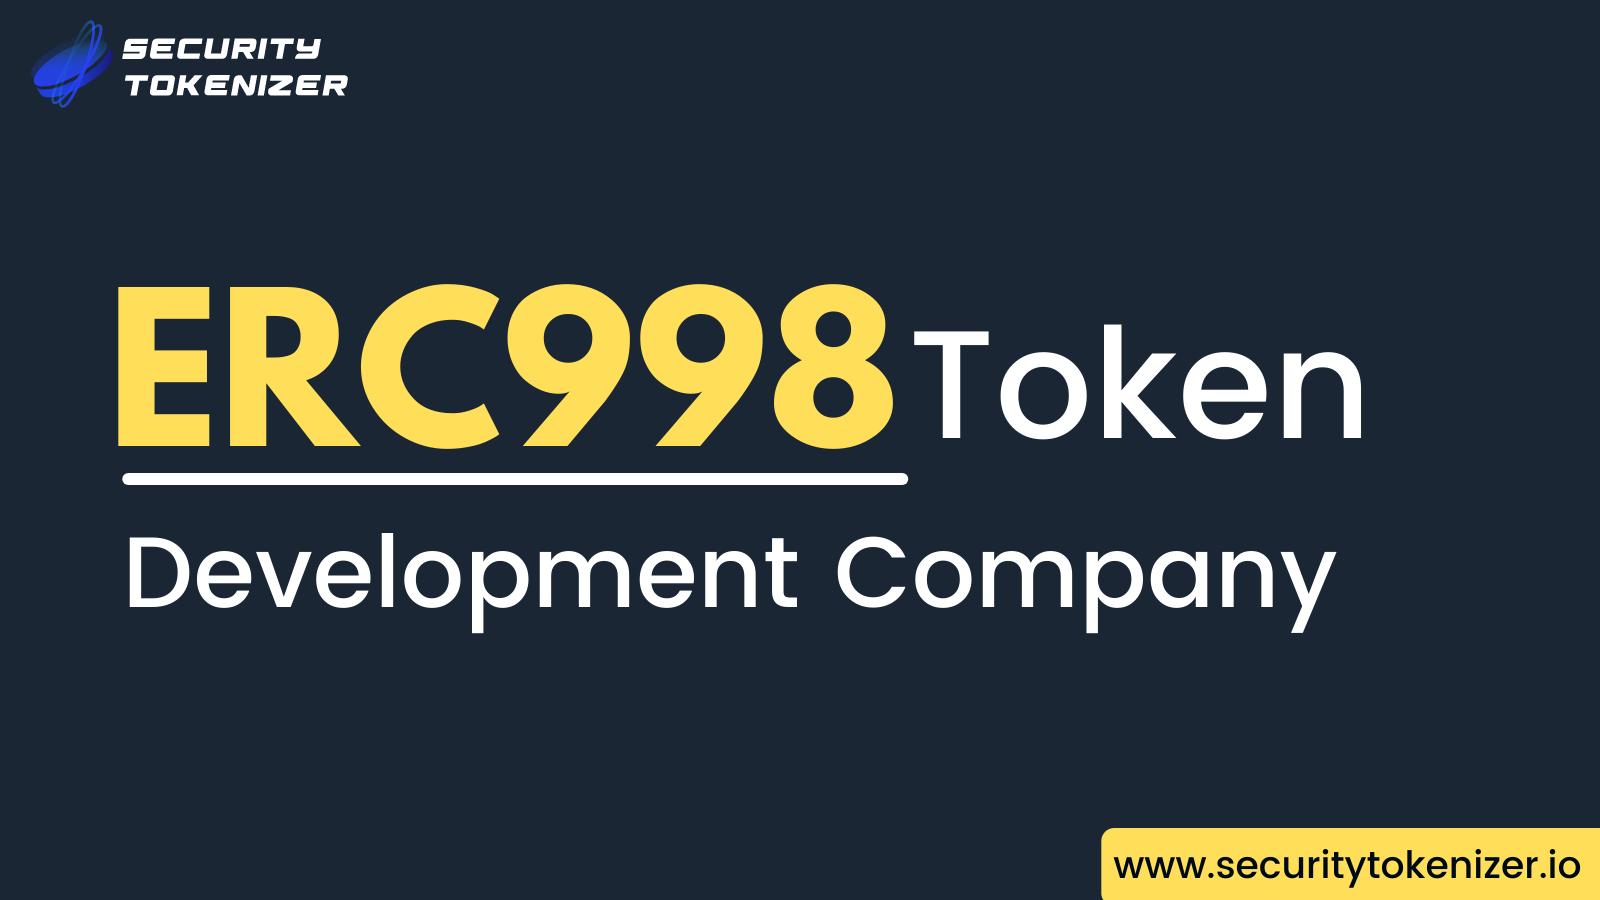 ERC998 Token Development Company